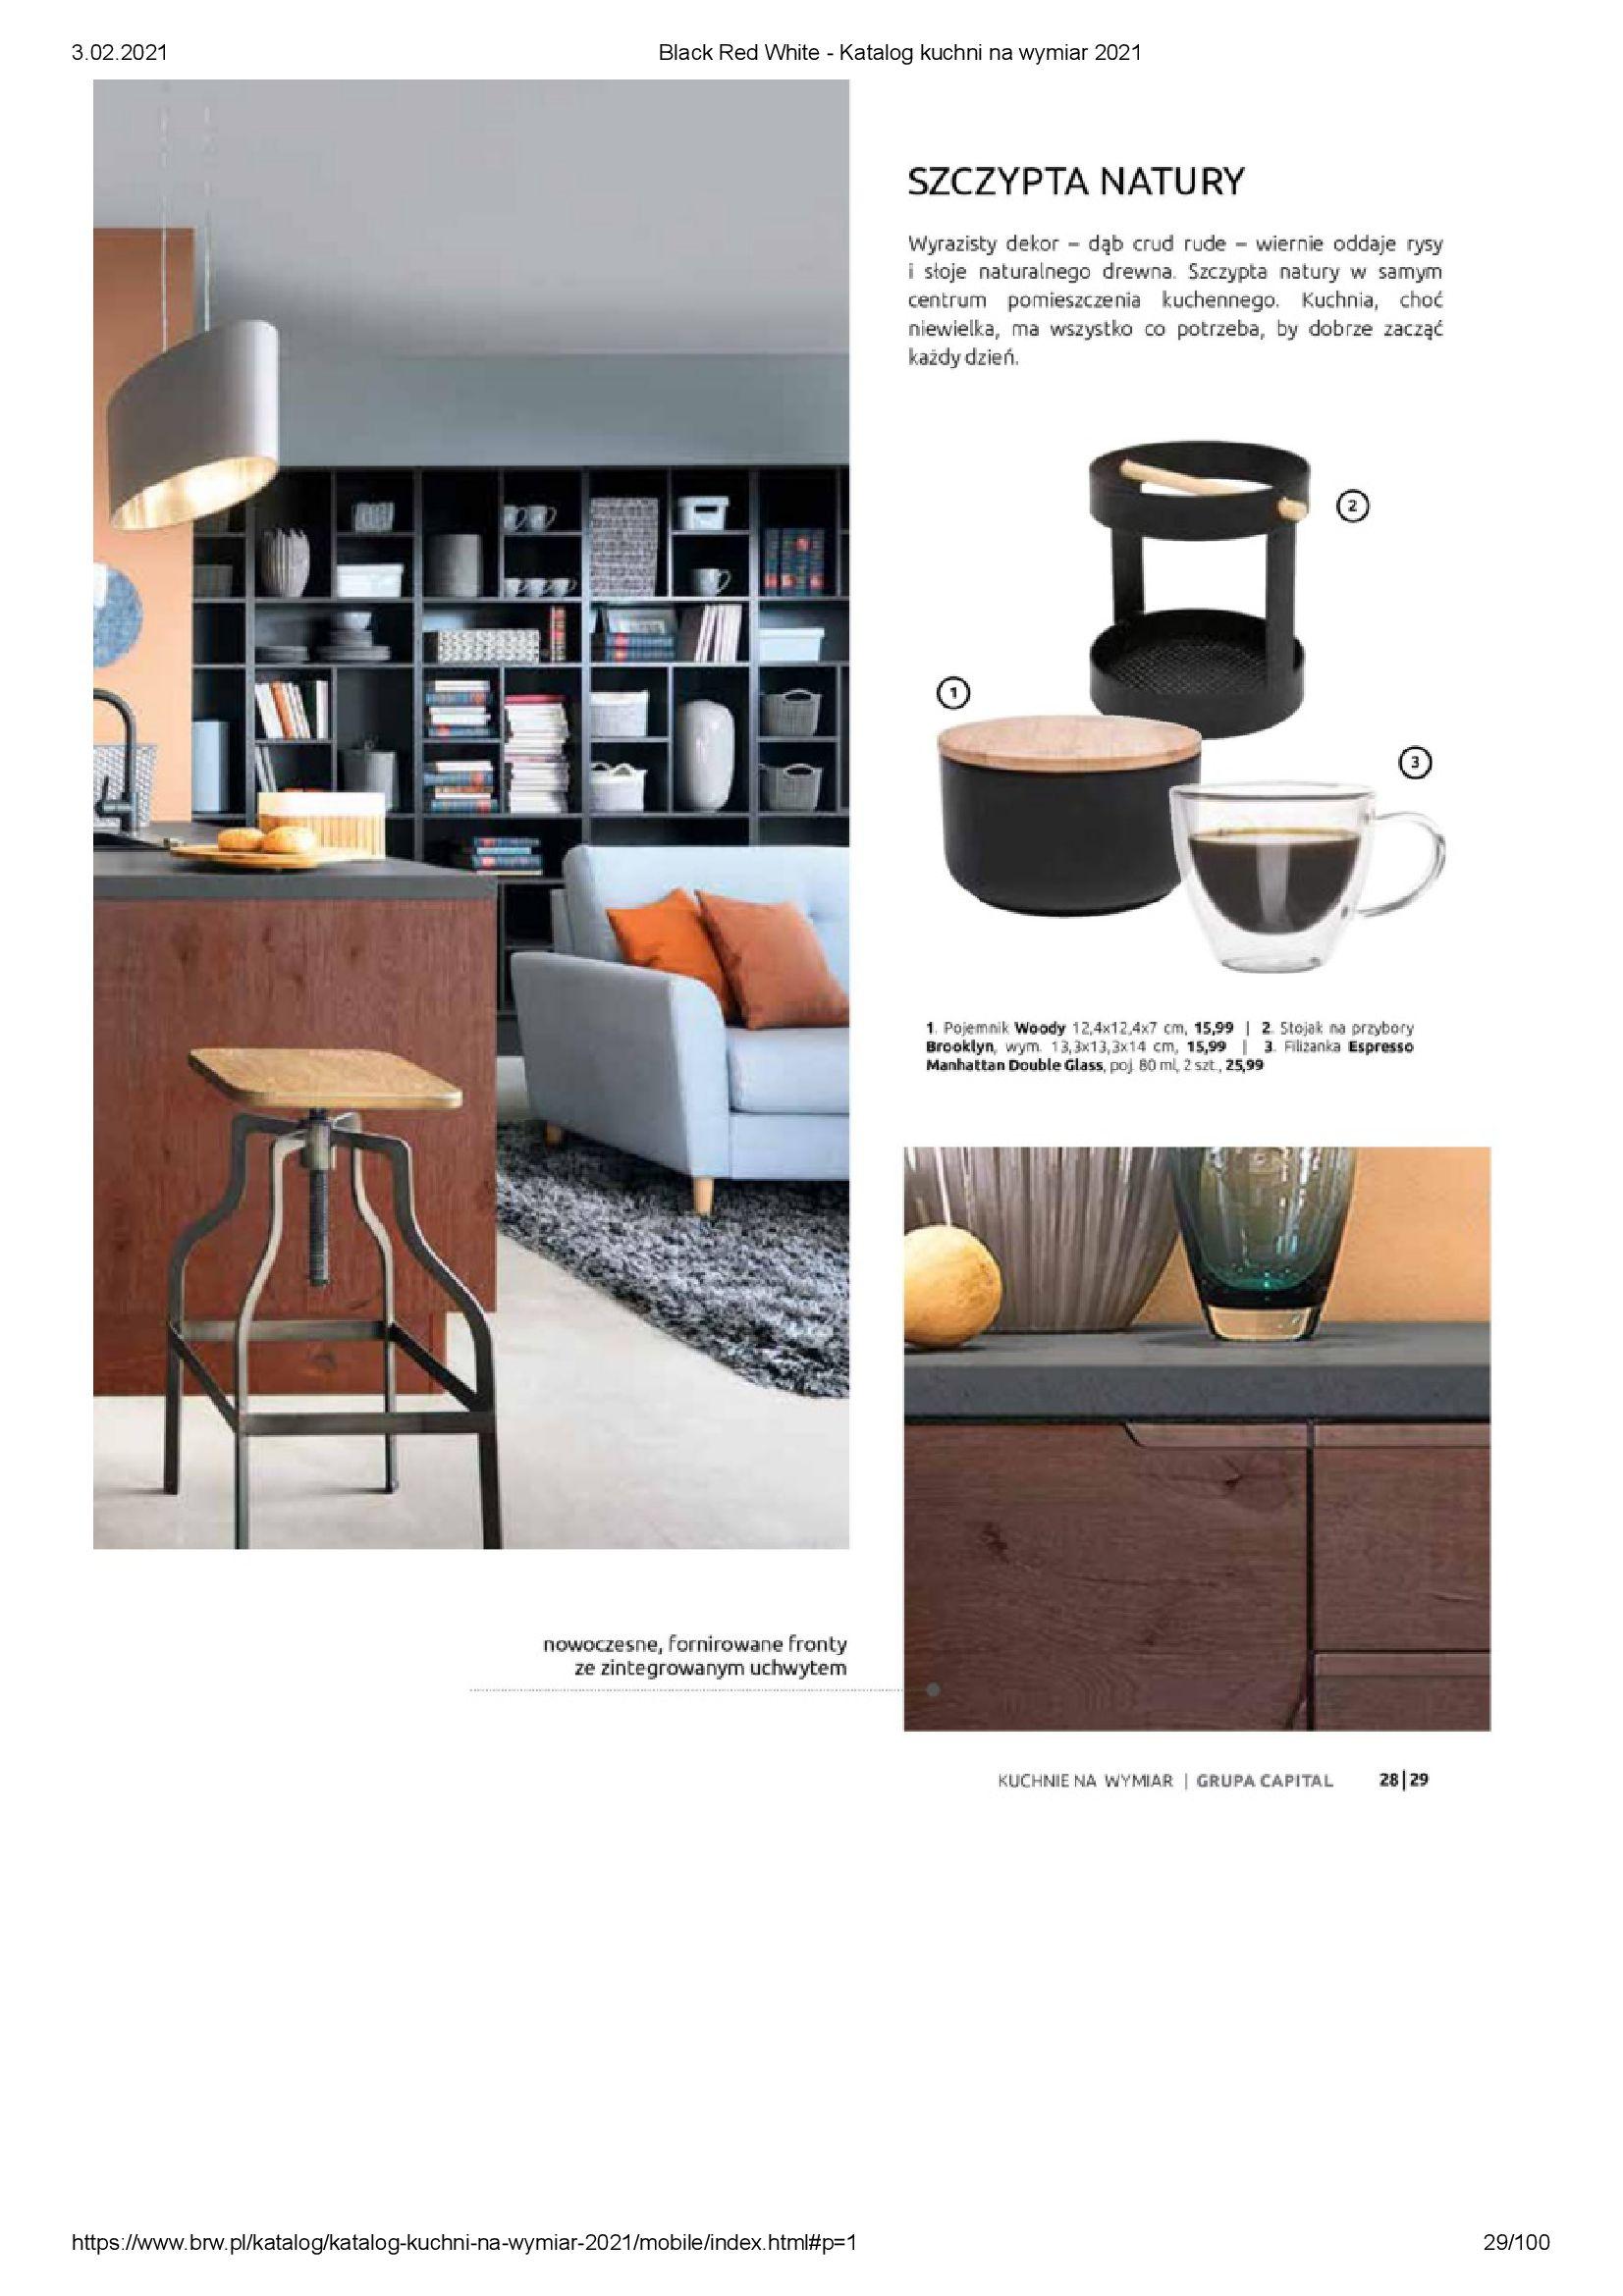 Gazetka Black Red White: Katalog - Kuchnie na wymiar Senso Kitchens 2021 2021-01-01 page-29